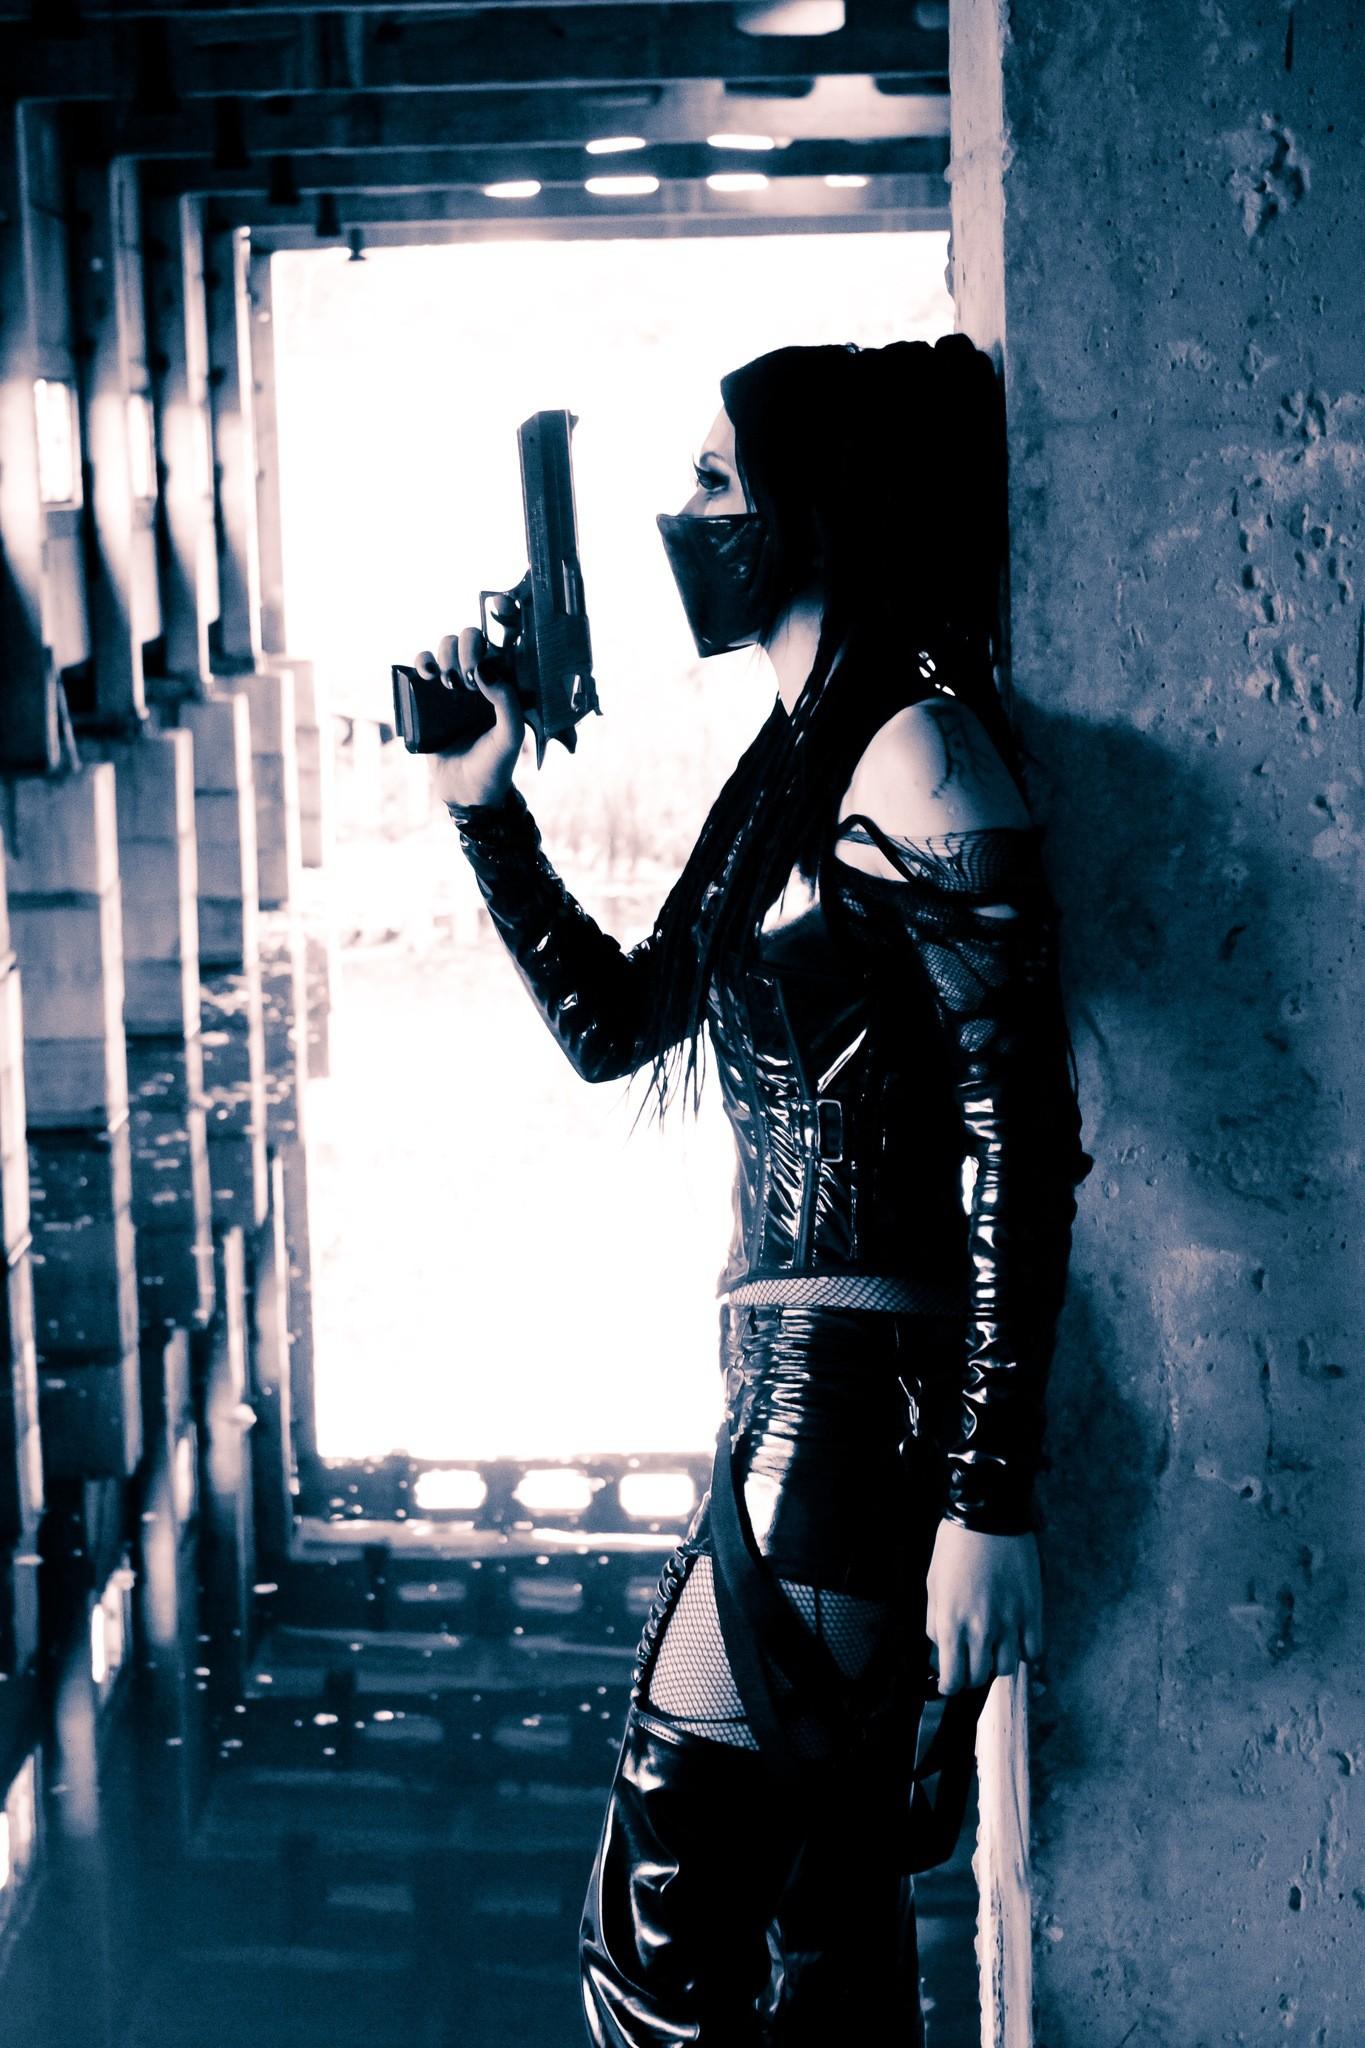 Fantasy Girl Hd Wallpaper Download Goth Background 183 ①